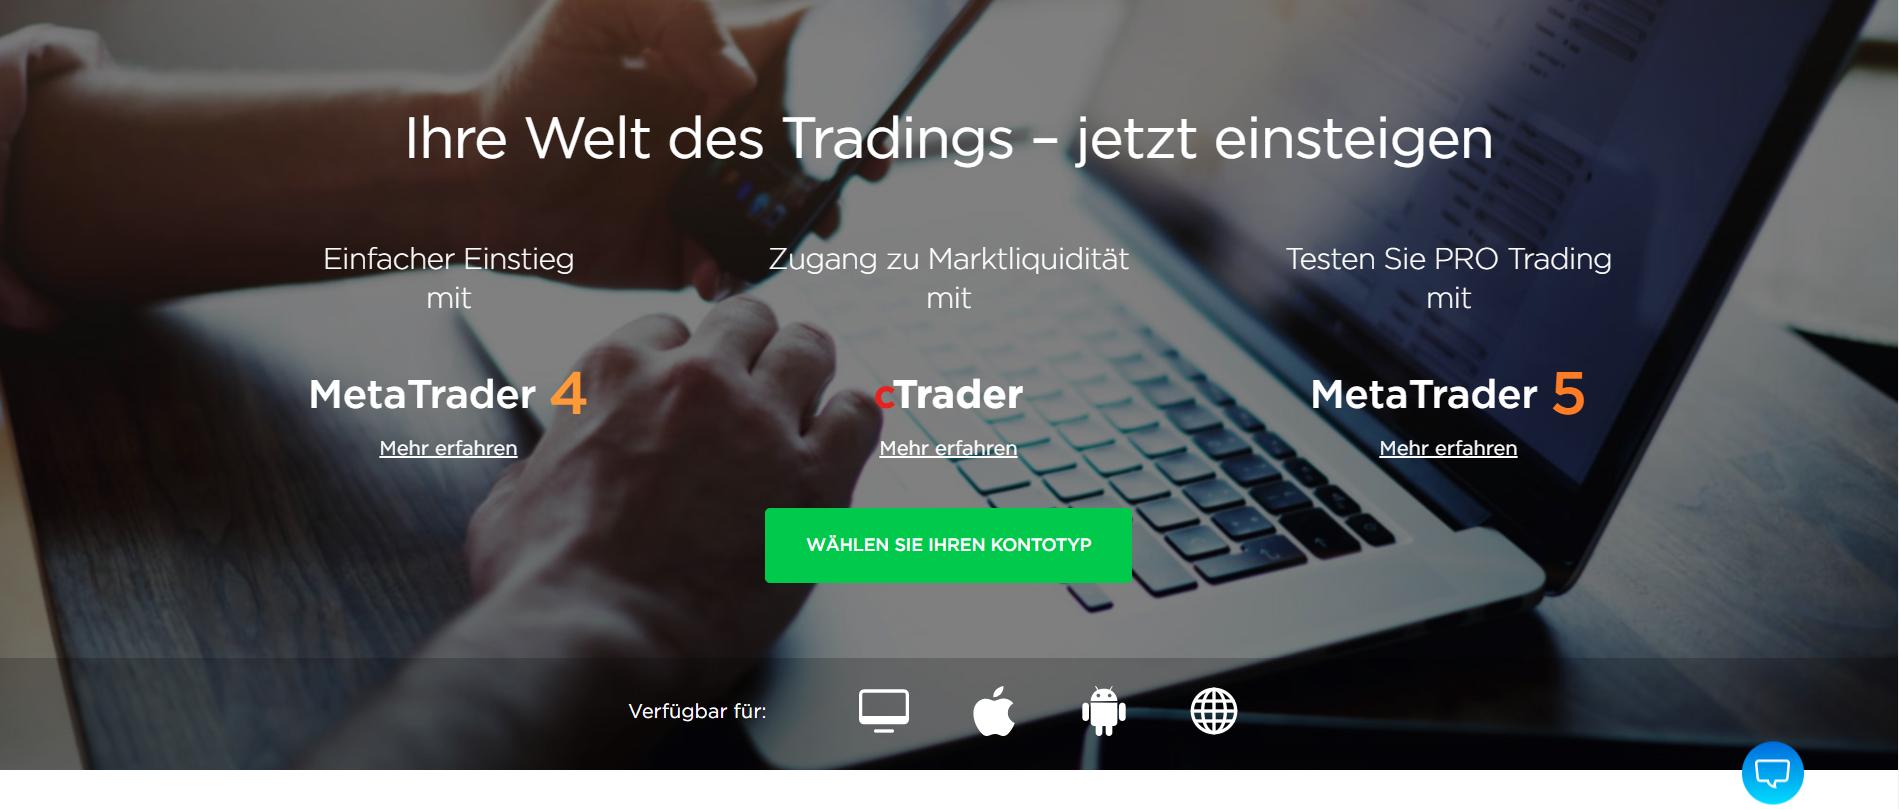 OctaFX bietet verschiedene Plattformen zum Traden an